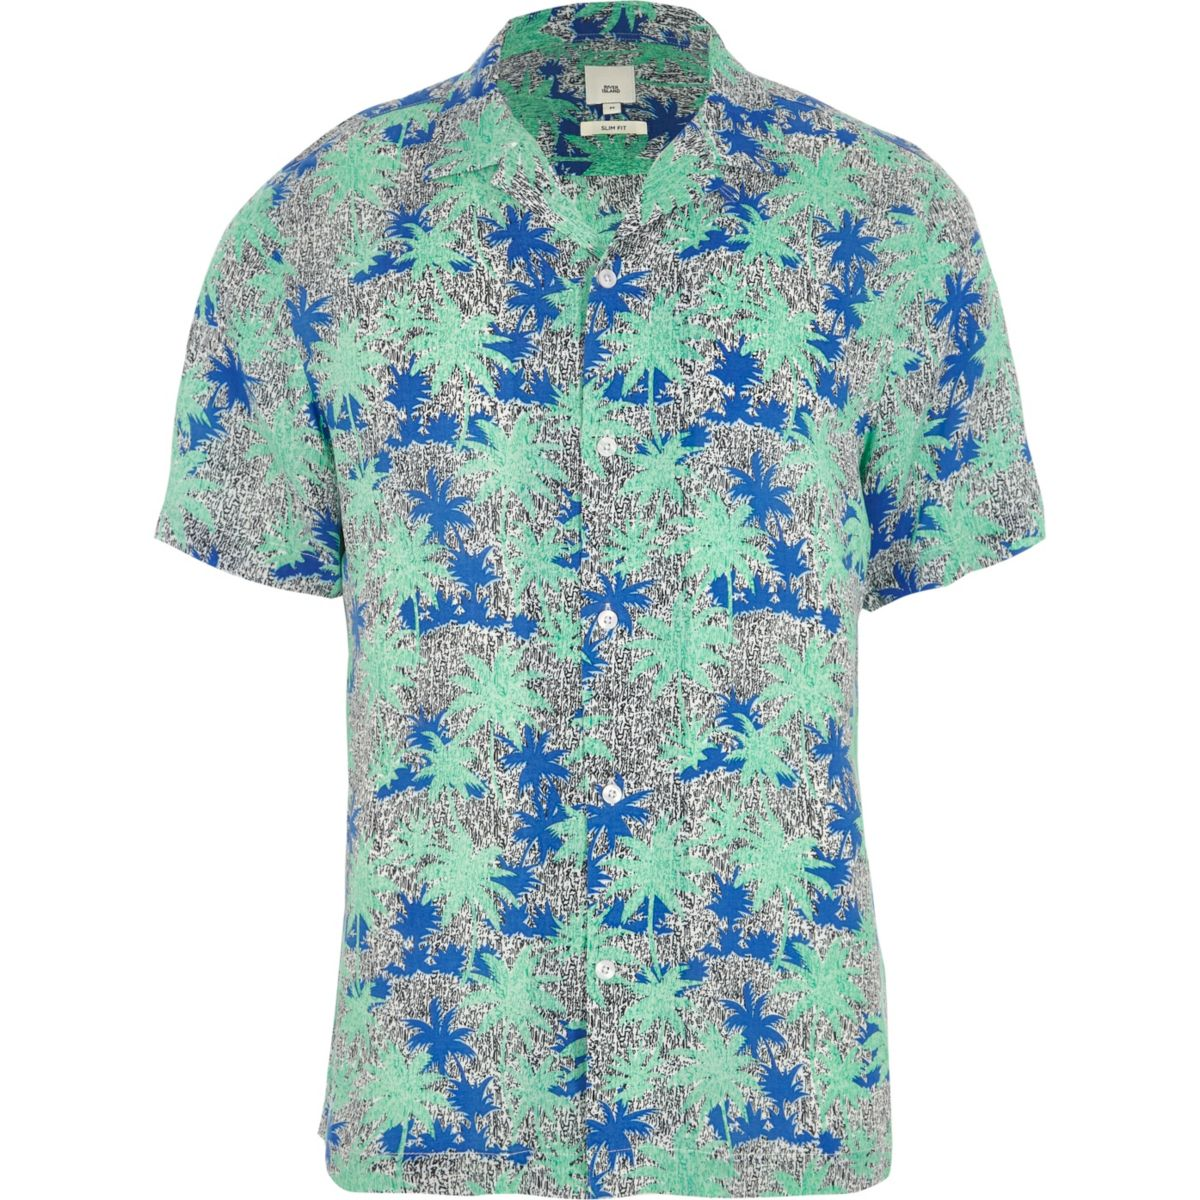 Green palm print short sleeve shirt